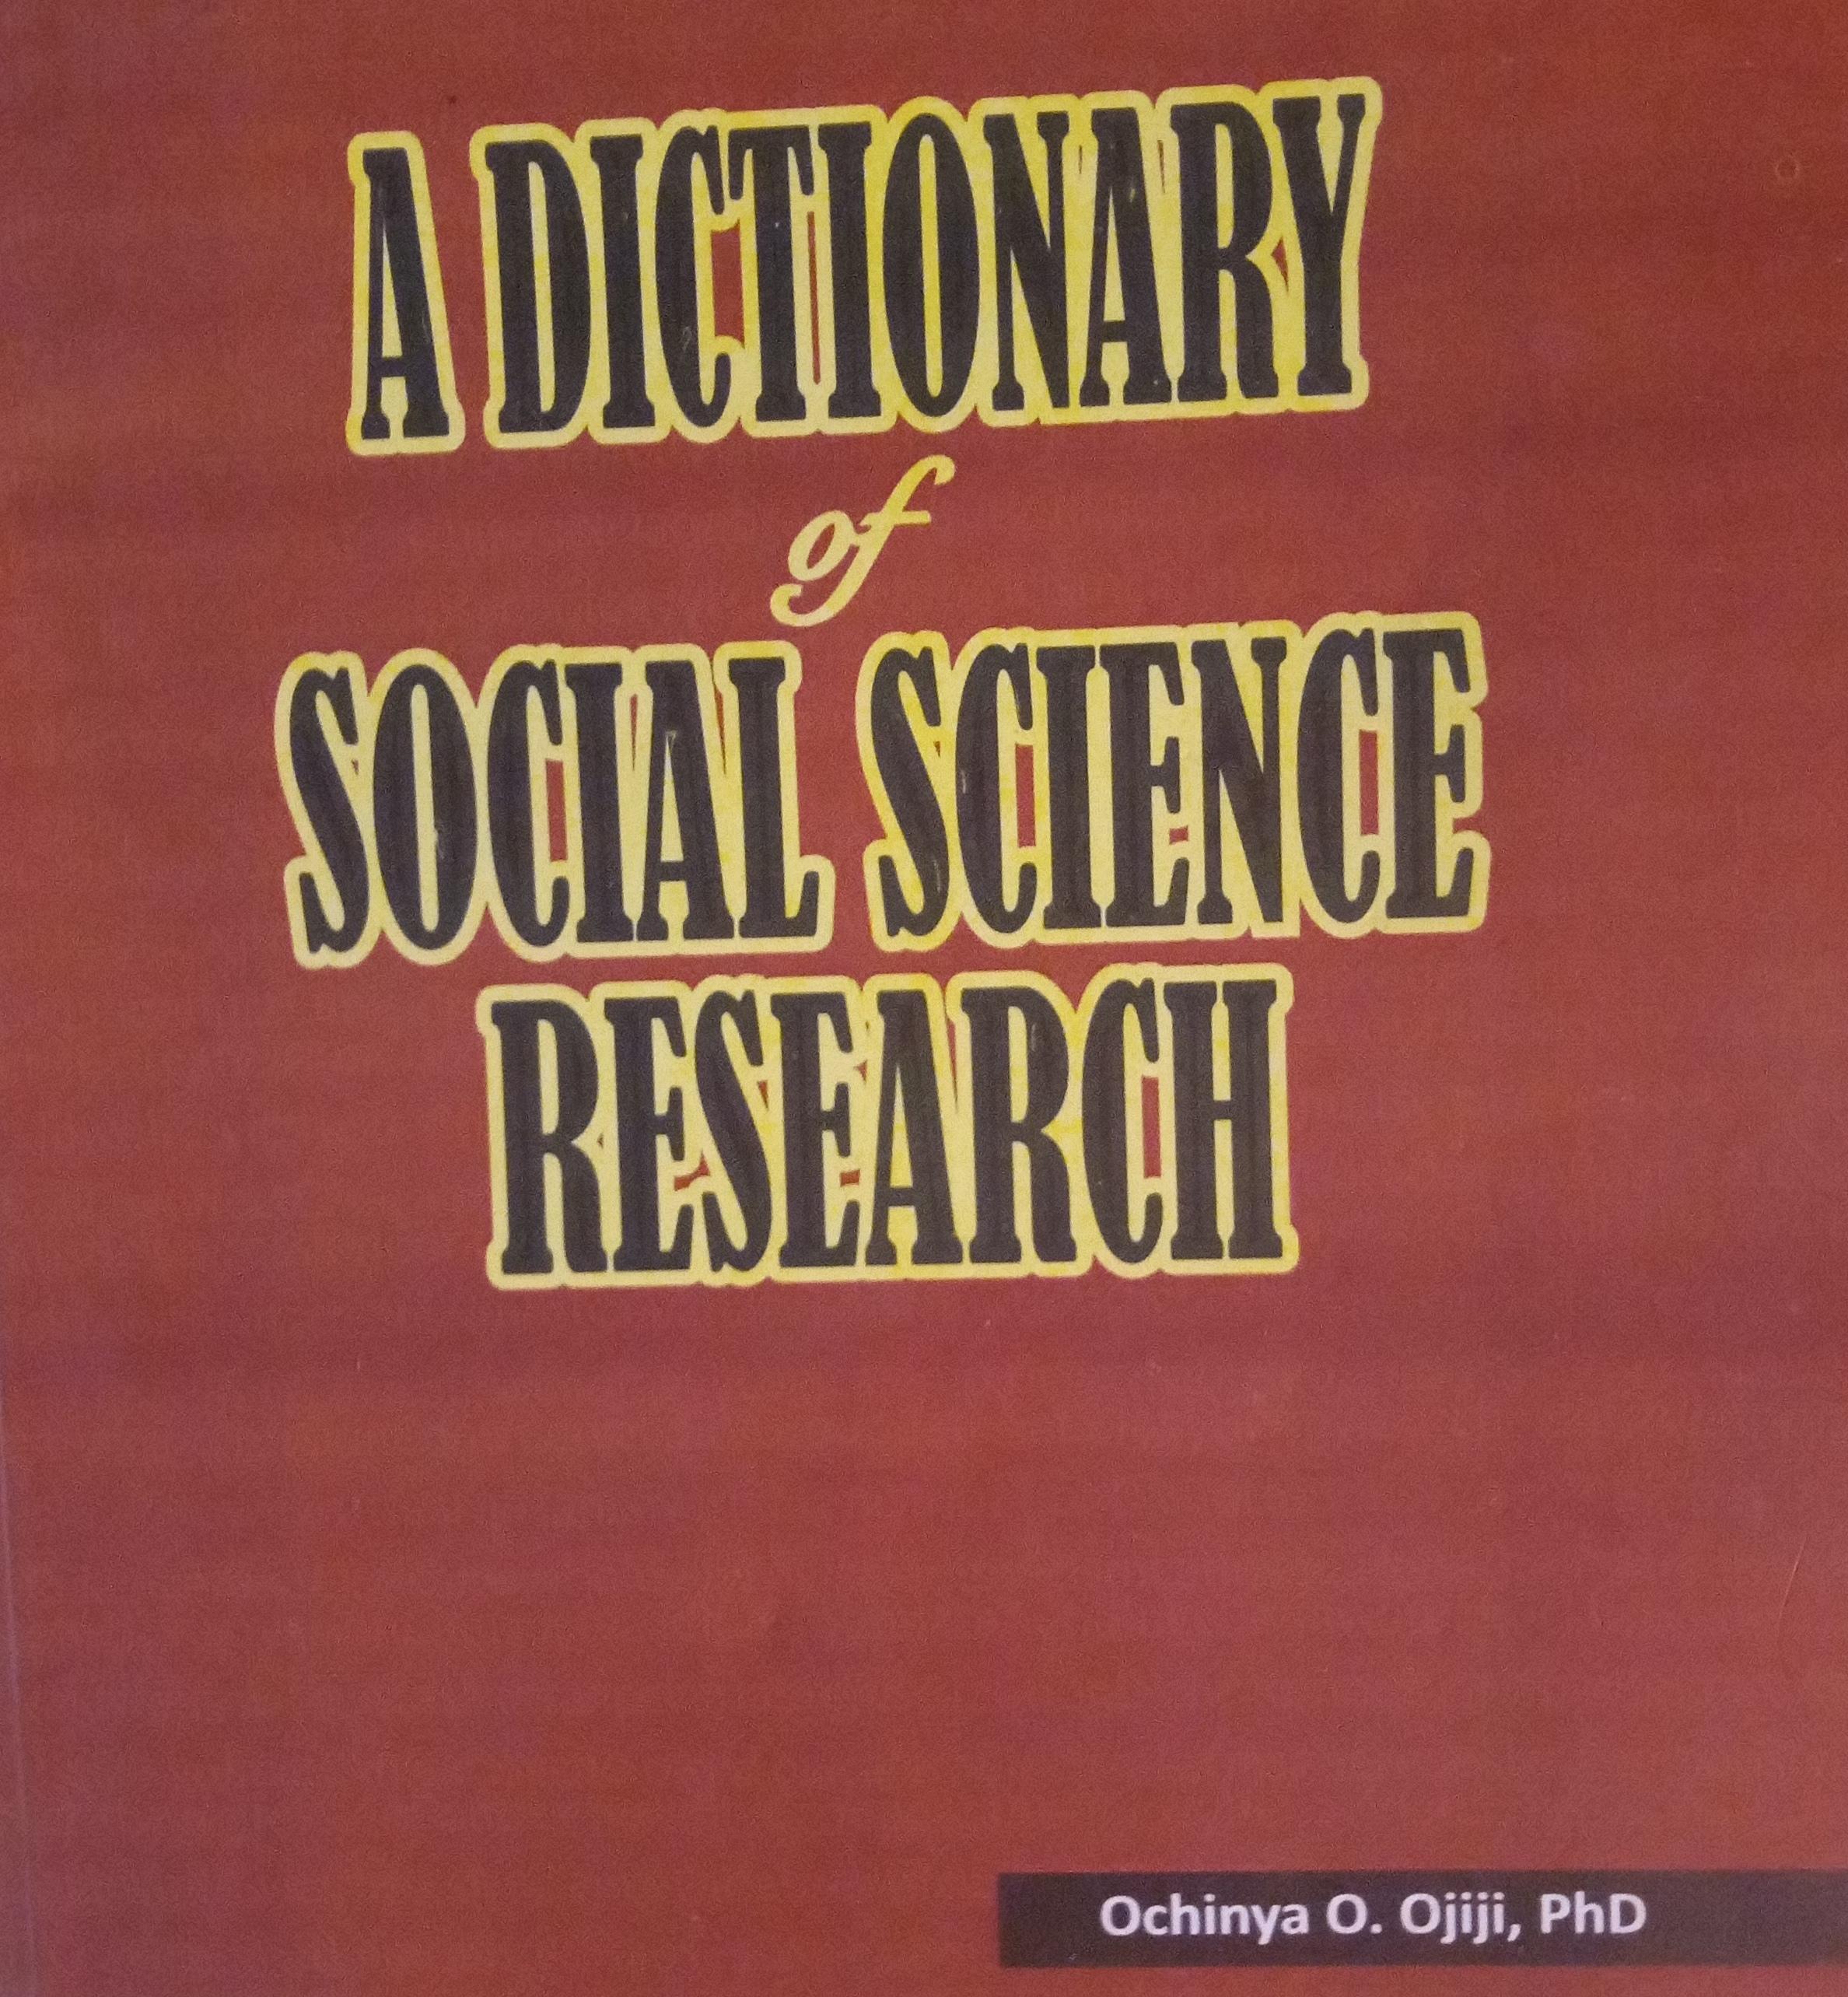 Prof Ochinya Ojiji's Parting Shot for Nigerian Social Science